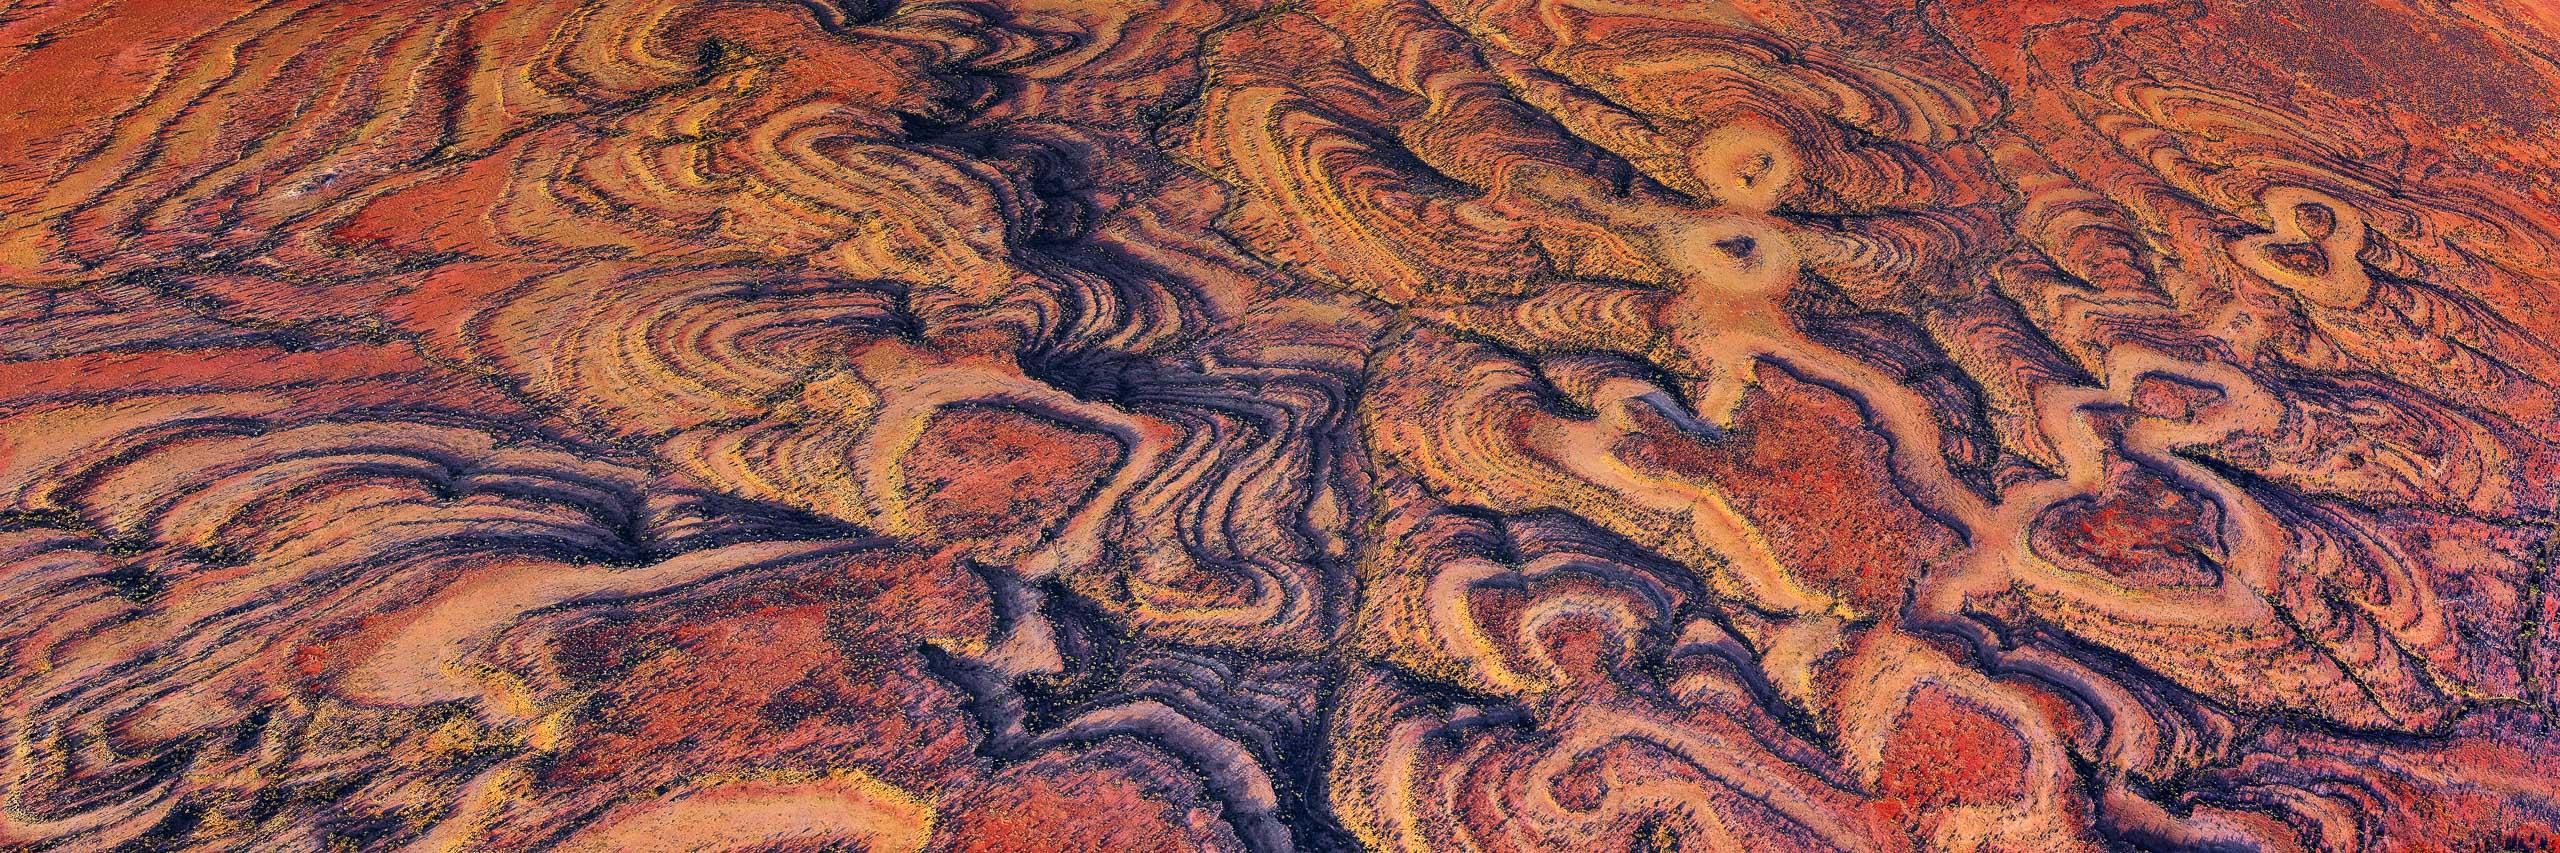 An aerial view of Running Man Rock, western Queensland, Australia.